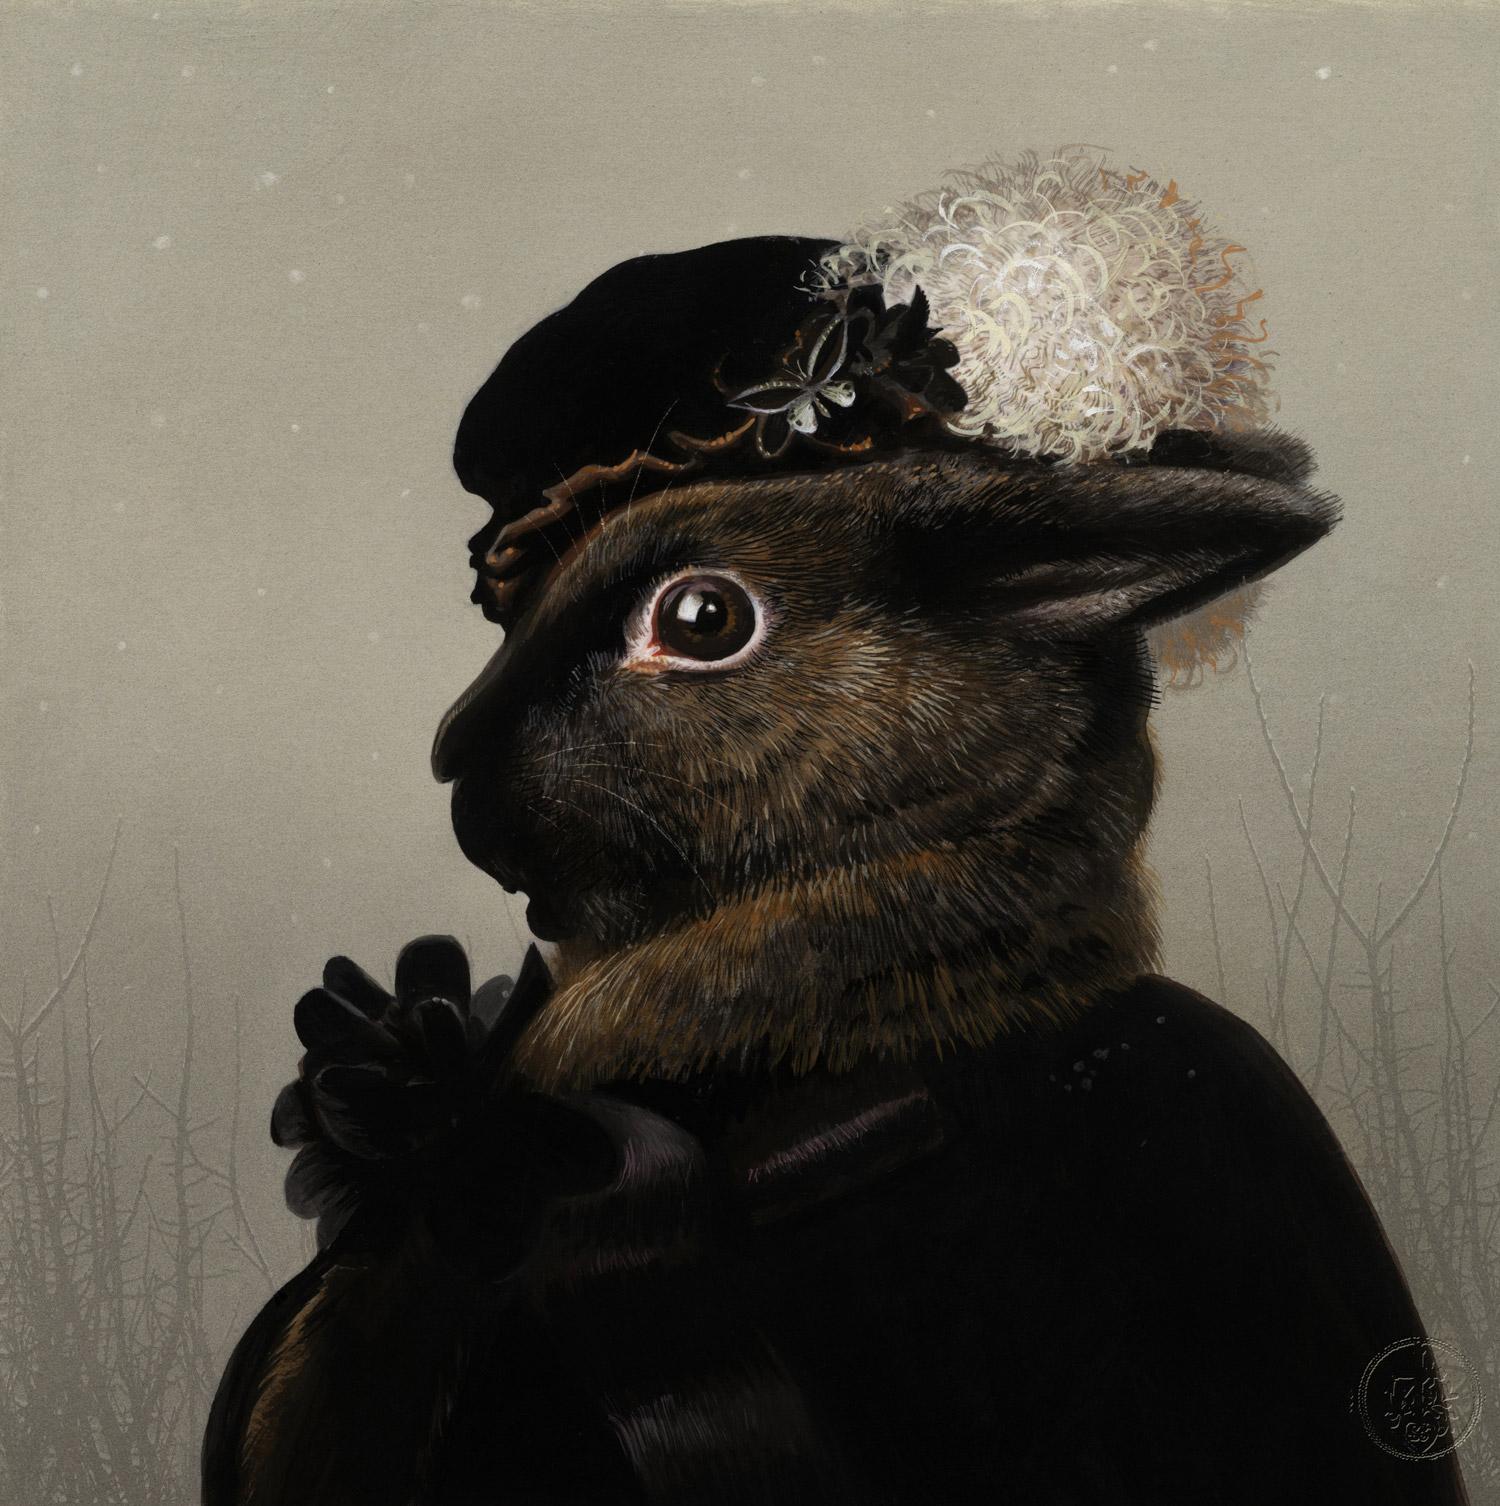 Bill Mayer - The Rabbit